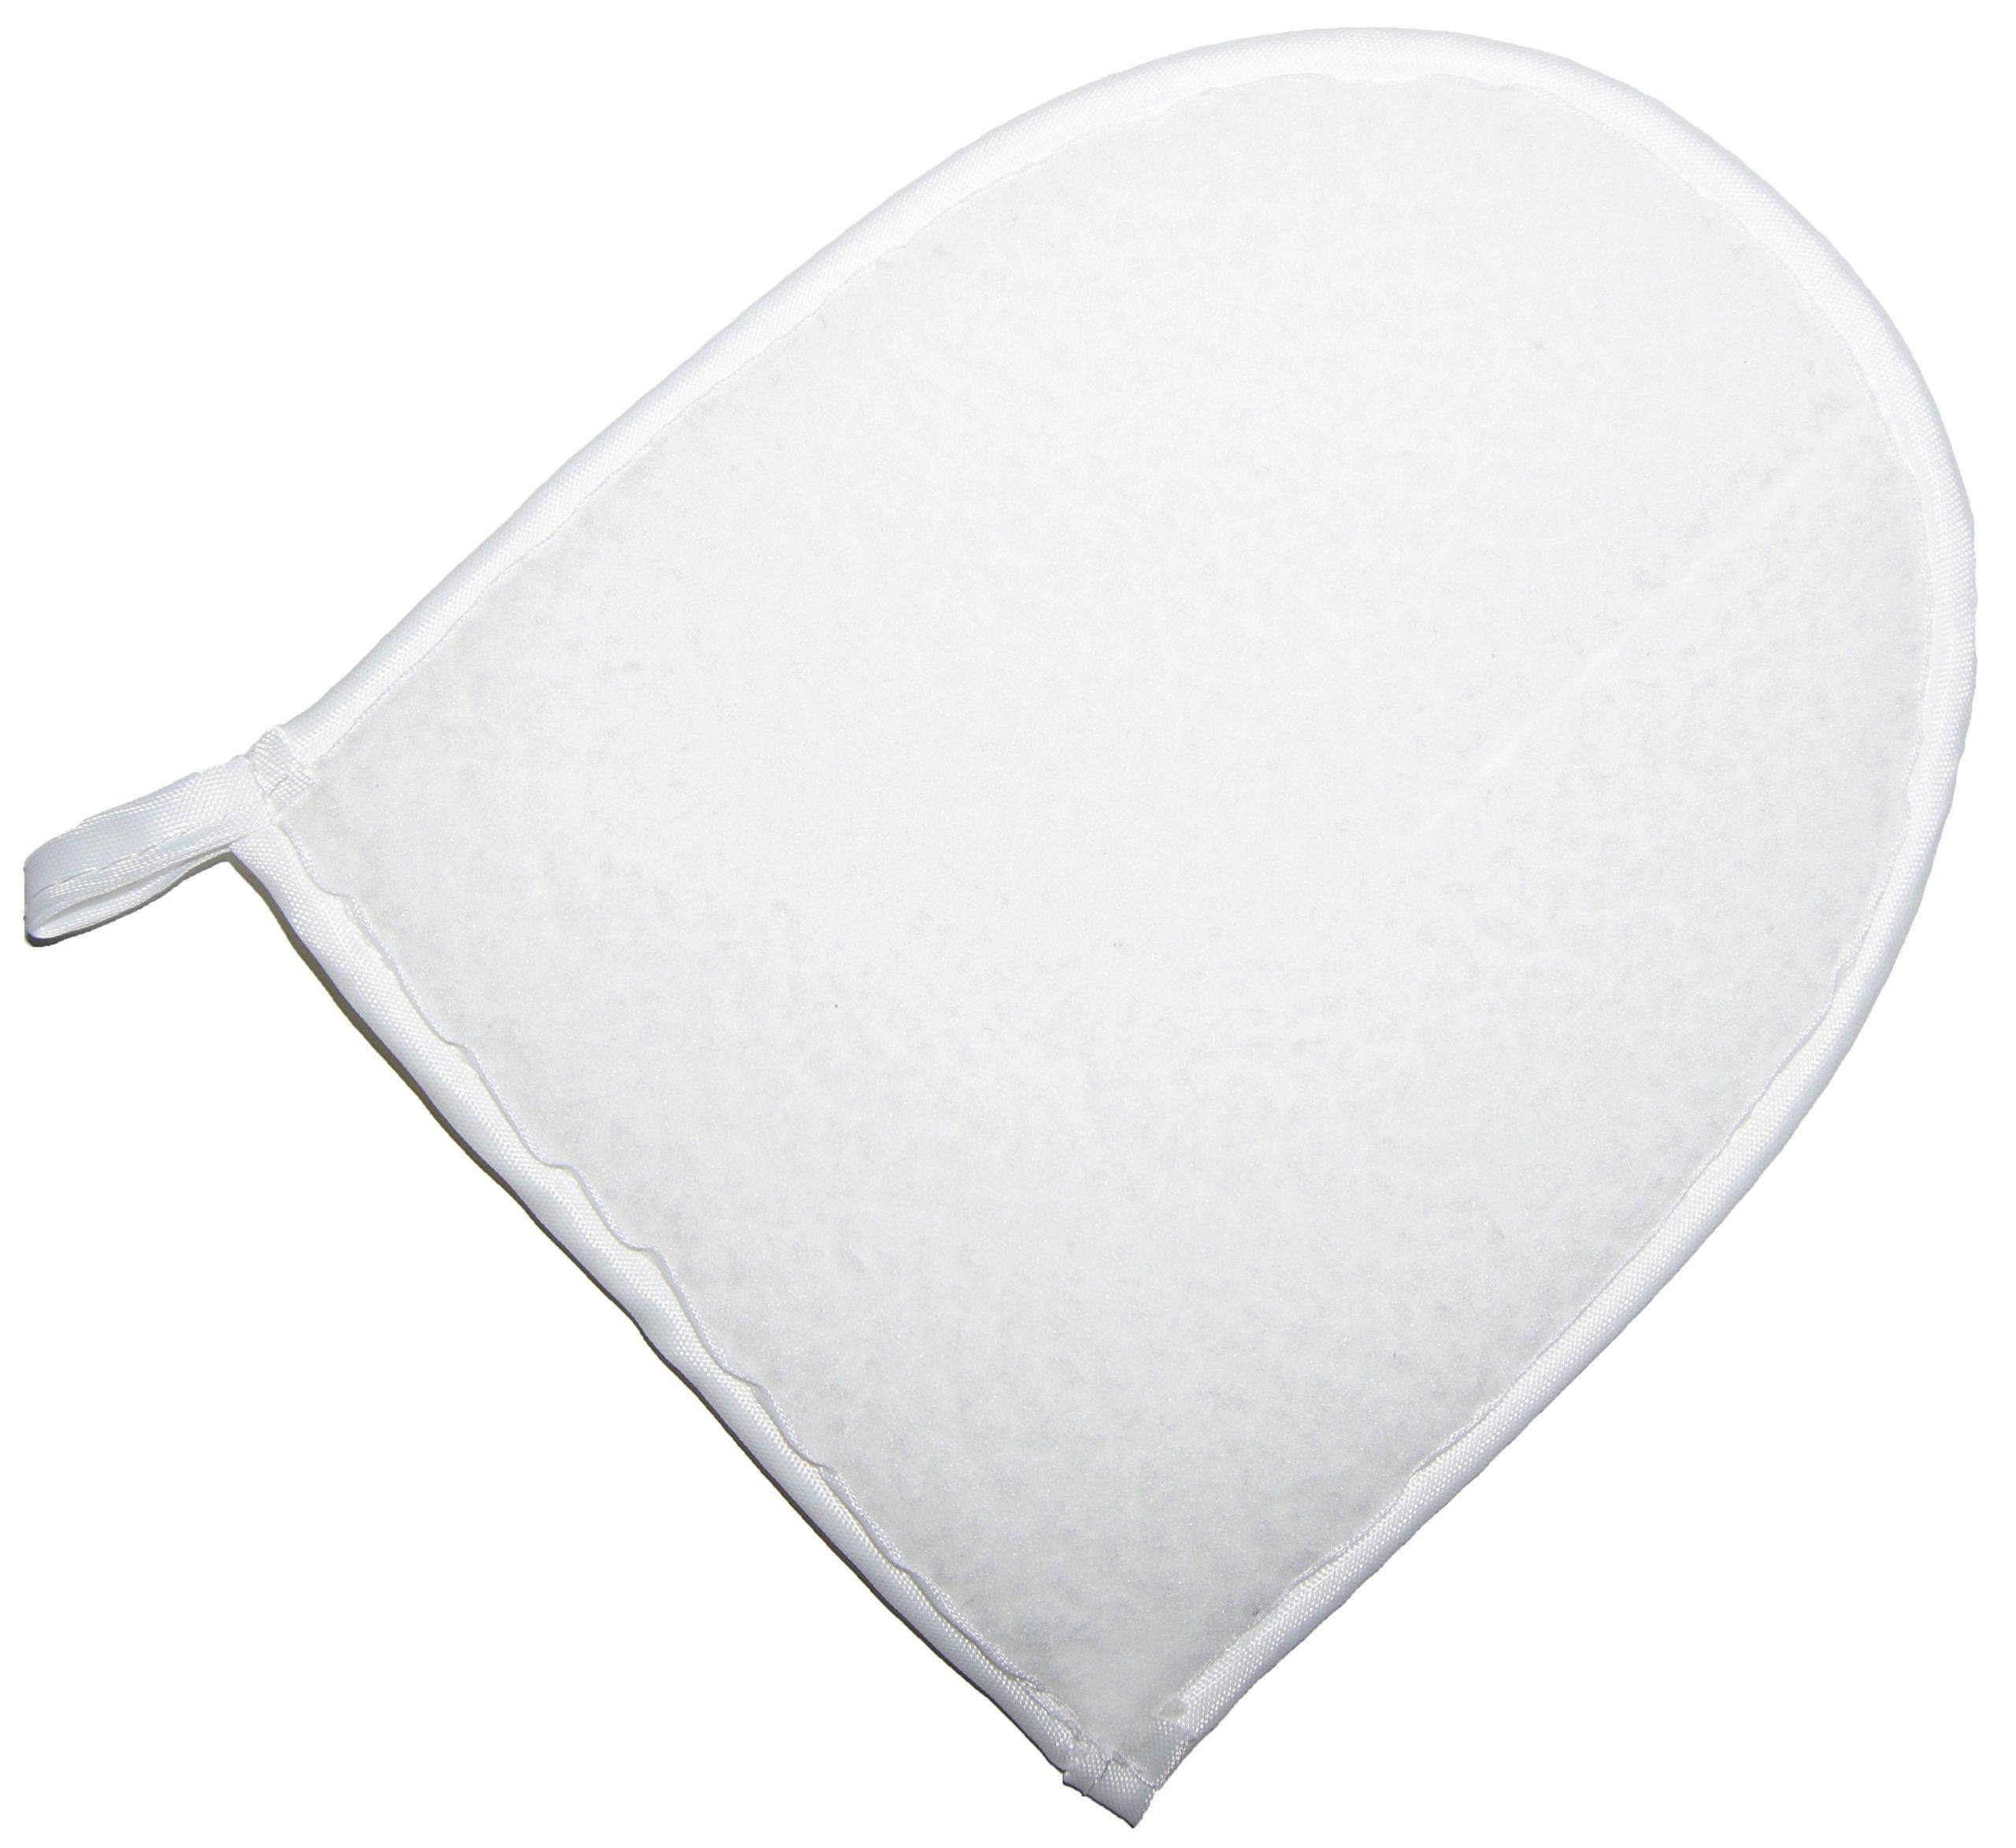 Shoeslulu Premium Shoe Shine Cloth with Breathable Mesh Glove Handle (3 Per Pack, Cream White)